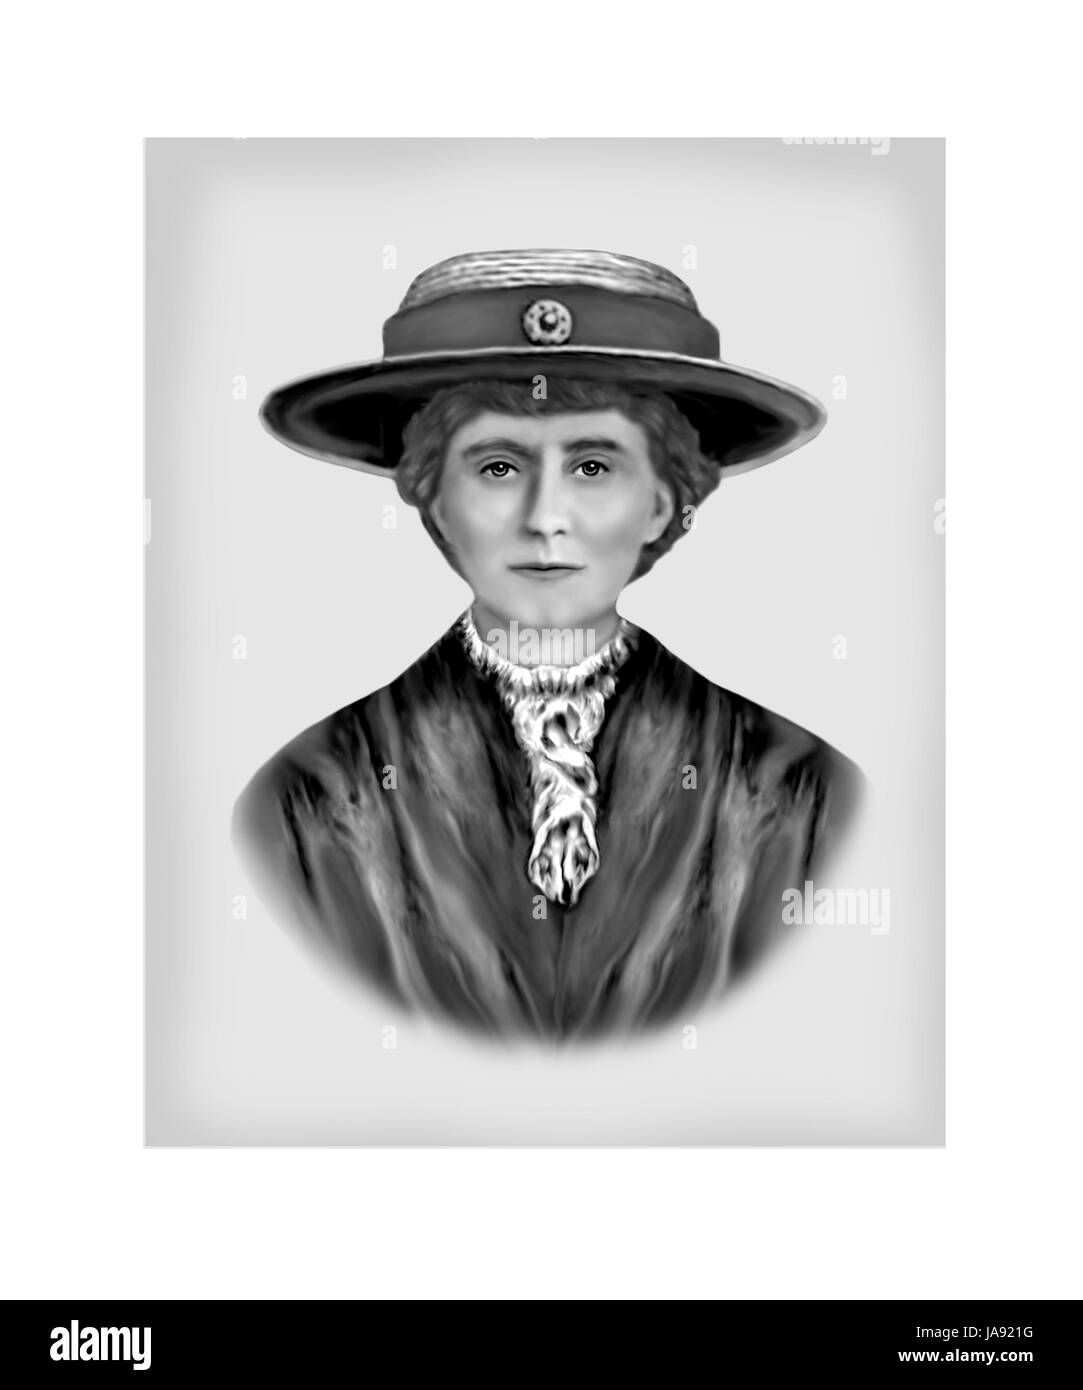 Emily Wilding Davison, 1872 - 1913, English Suffragette - Stock Image